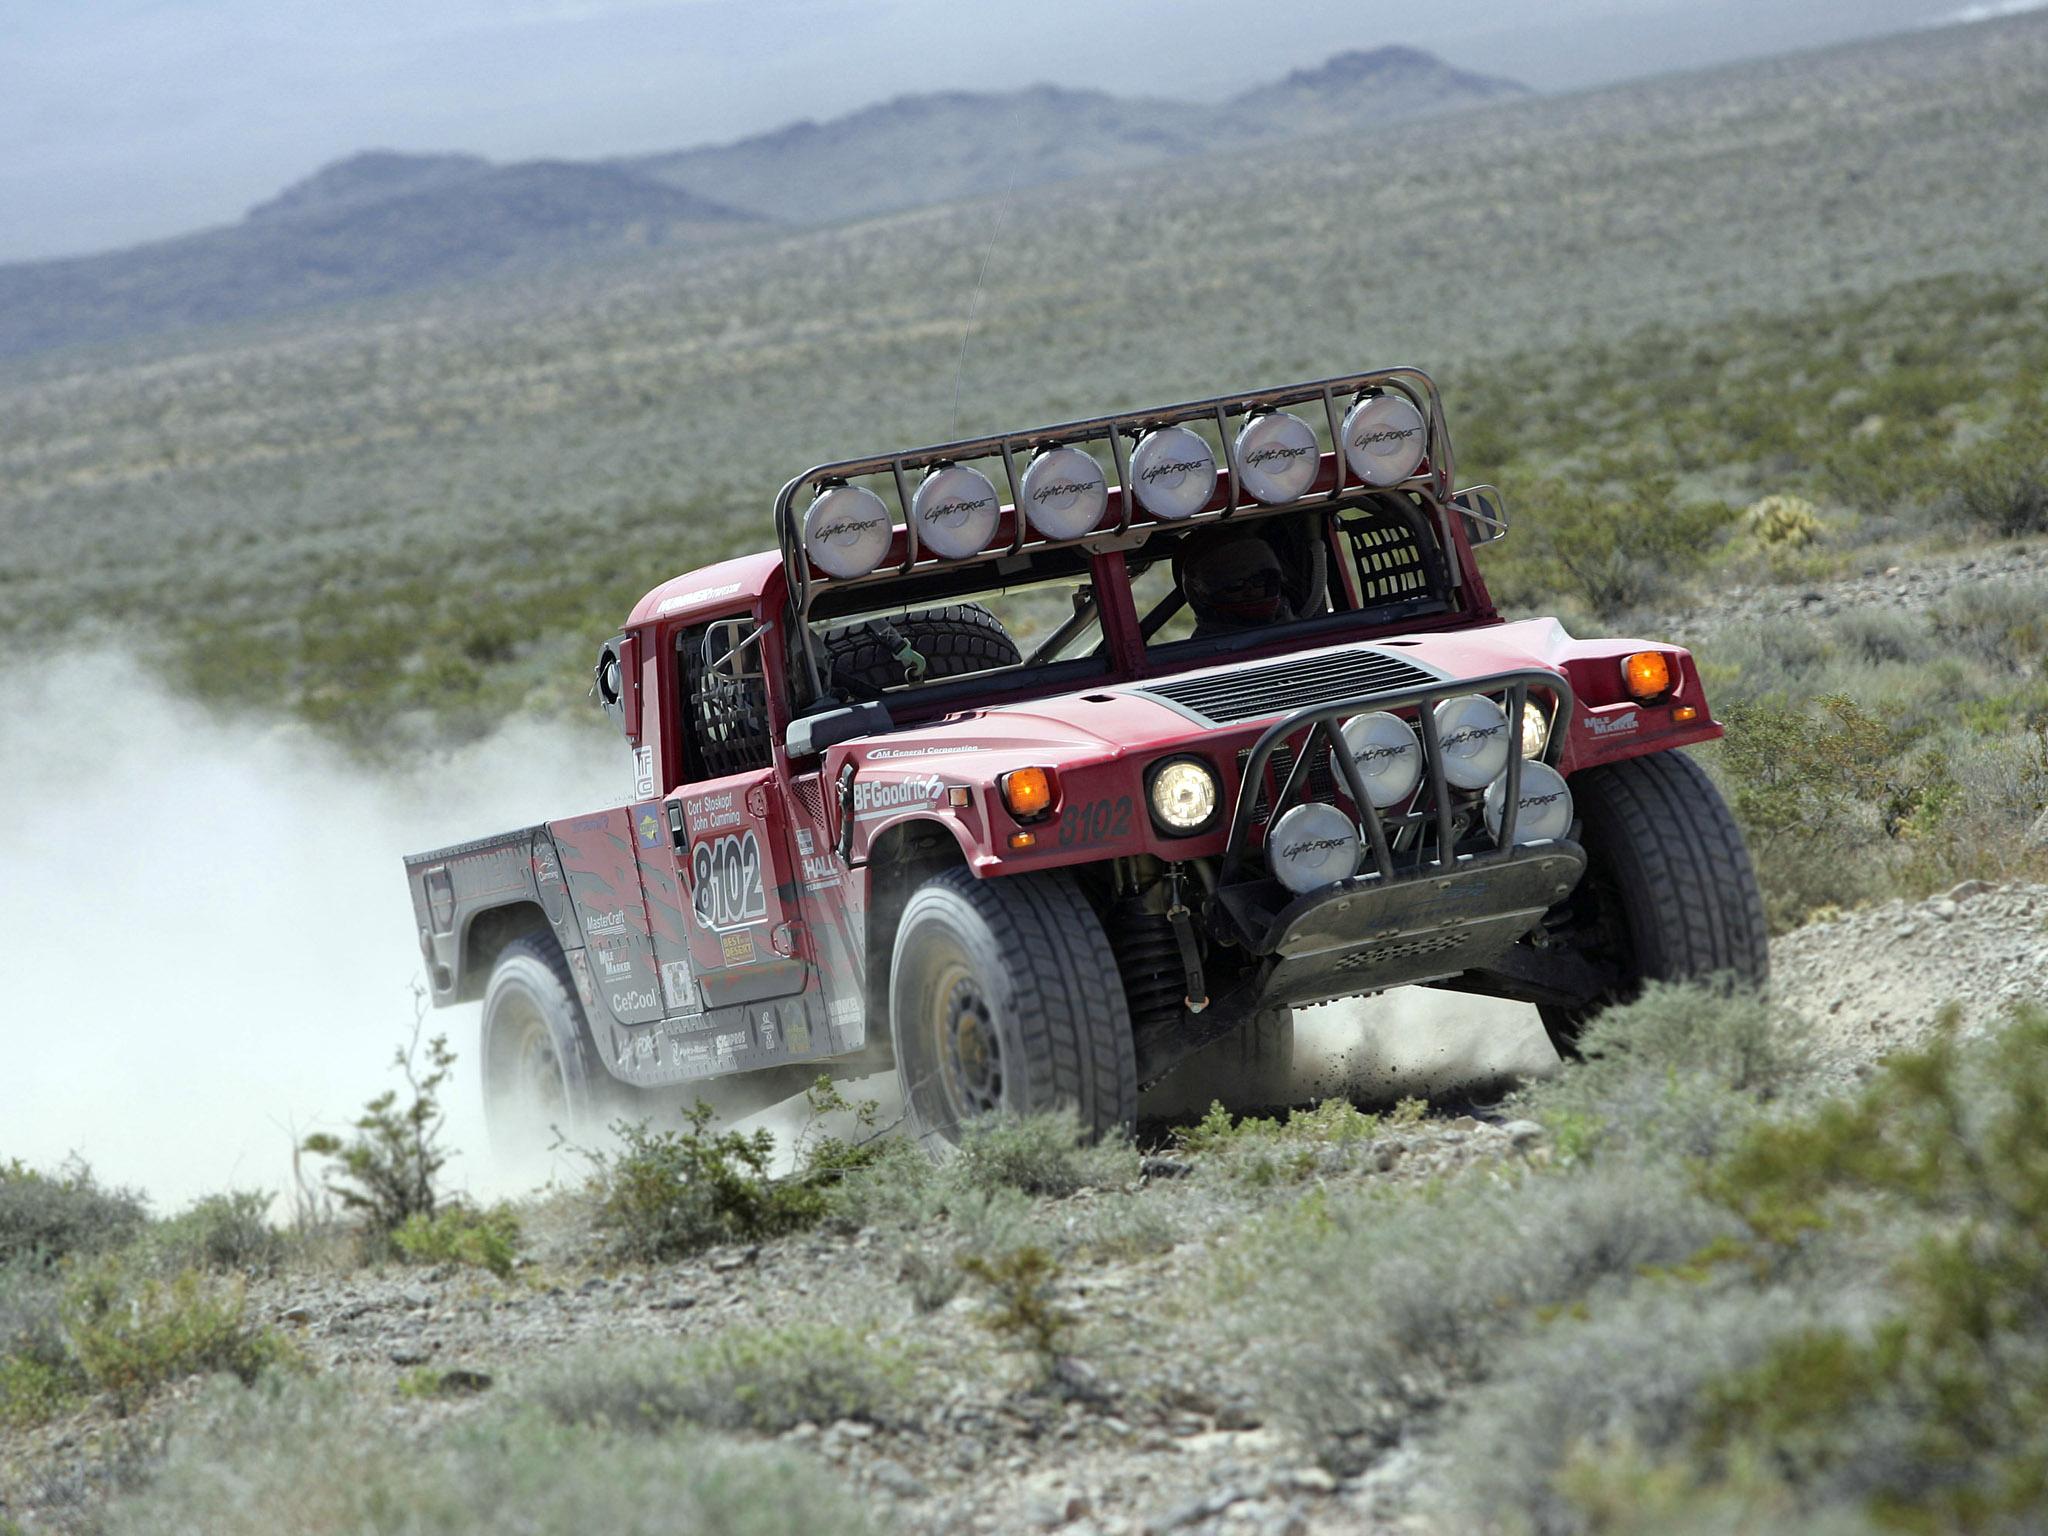 2006 Hummer H1 Alpha Rally Truck offroad 4x4 race racing vee